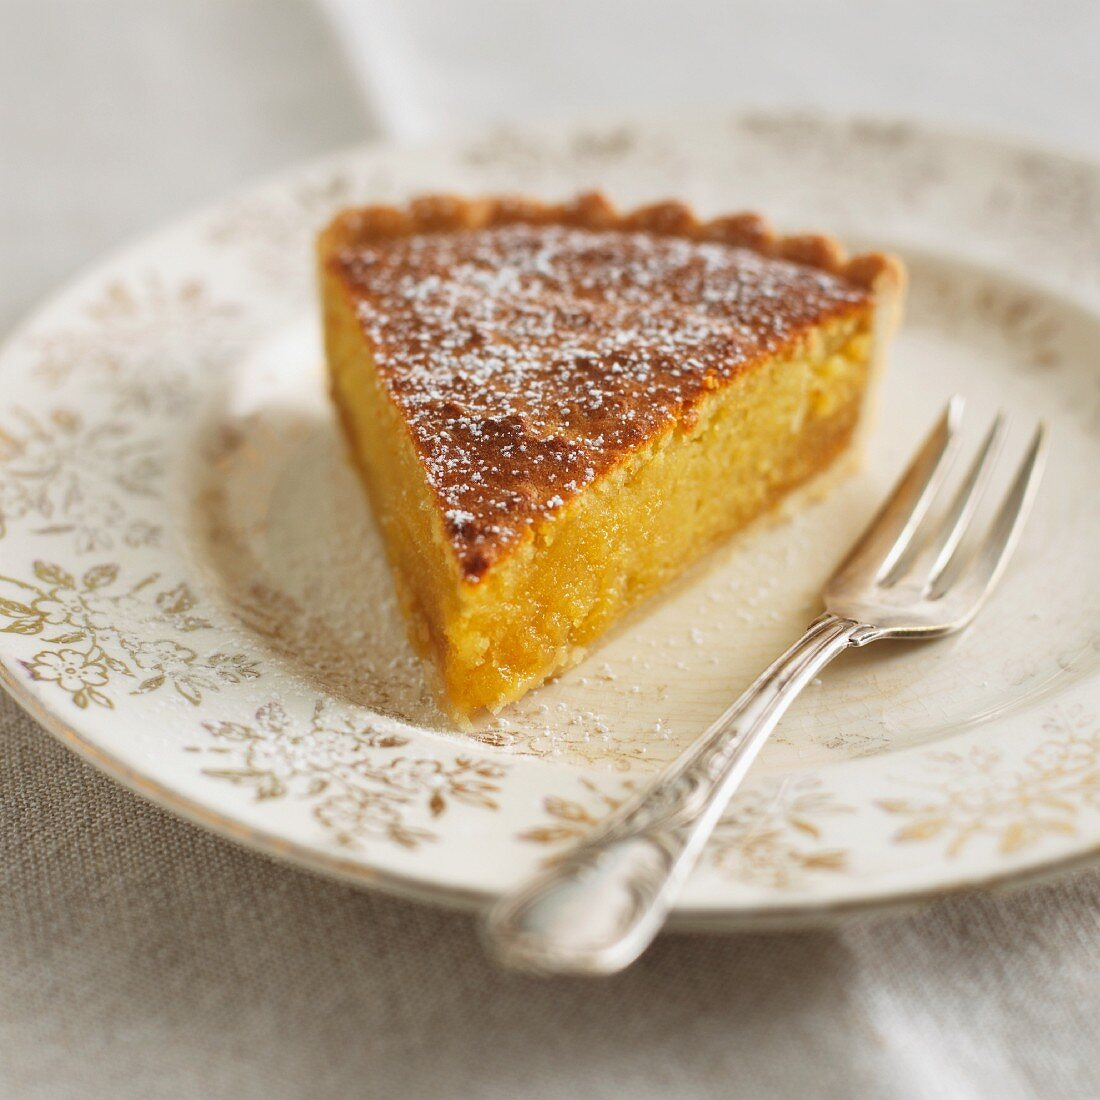 A piece of almond-syrup tart